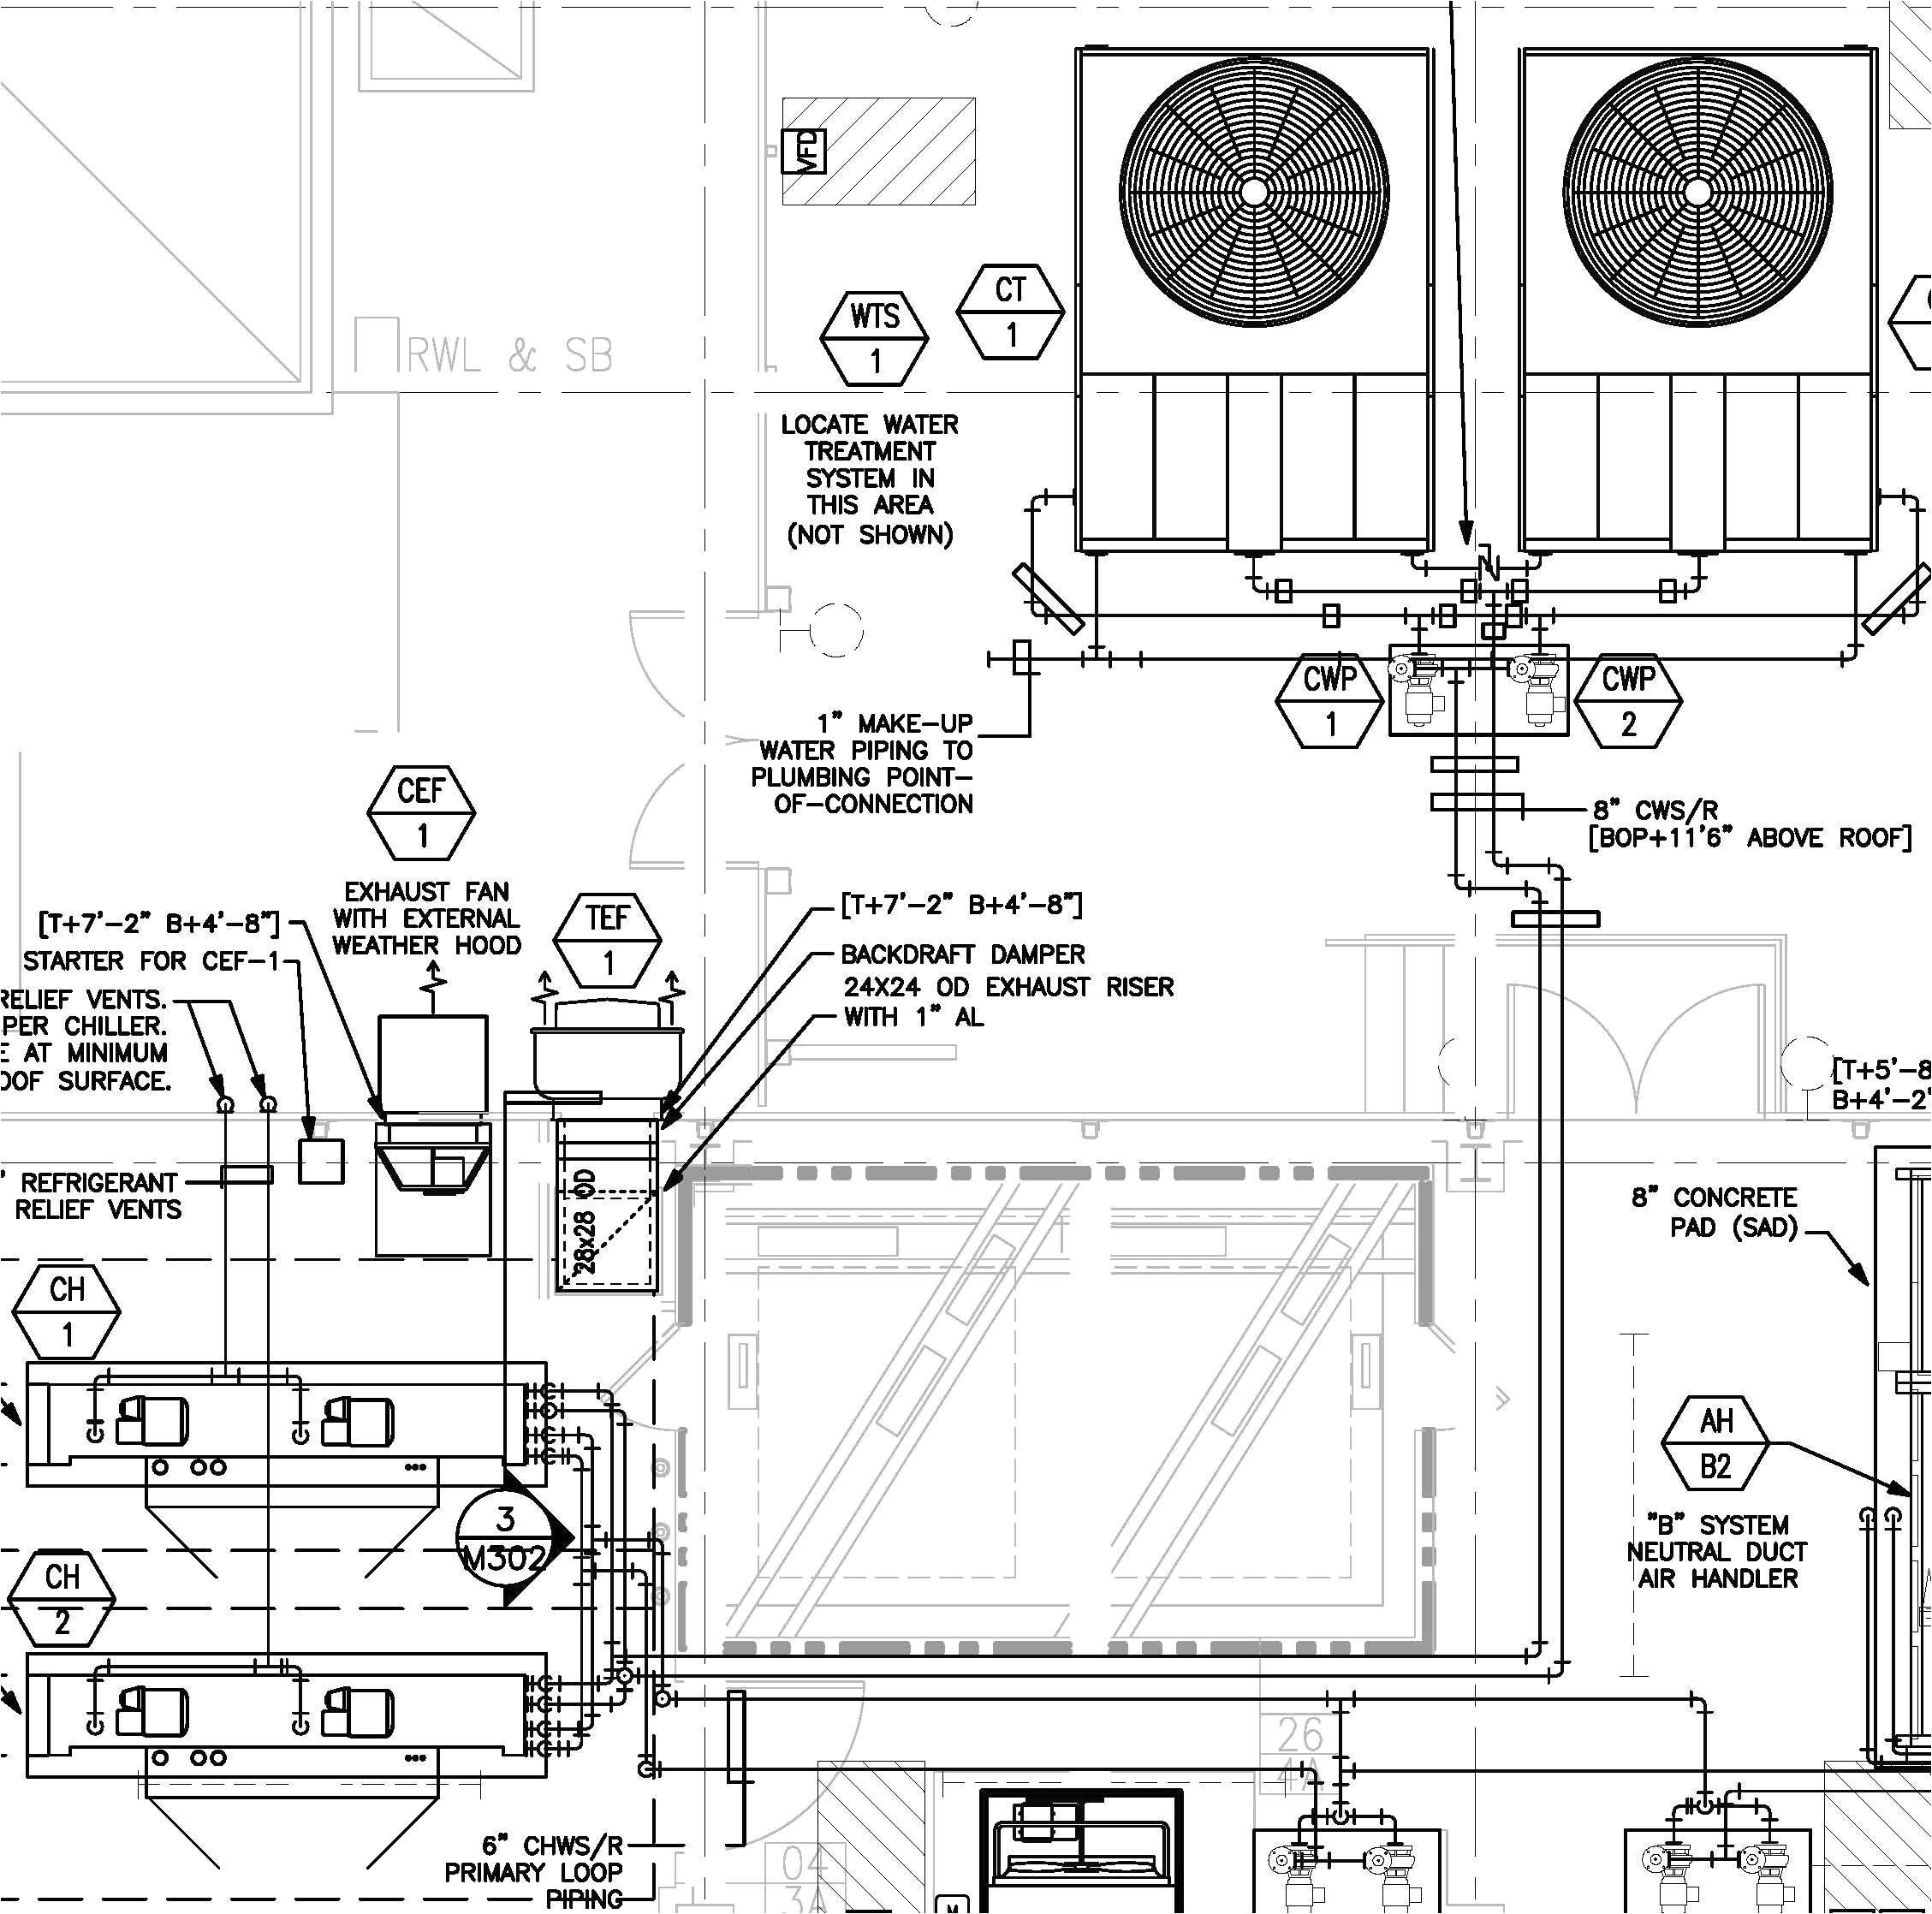 dvr wiring diagrams wiring diagram albumsdiagrams19971998mypicture1770981997evtm311spdctrljpg